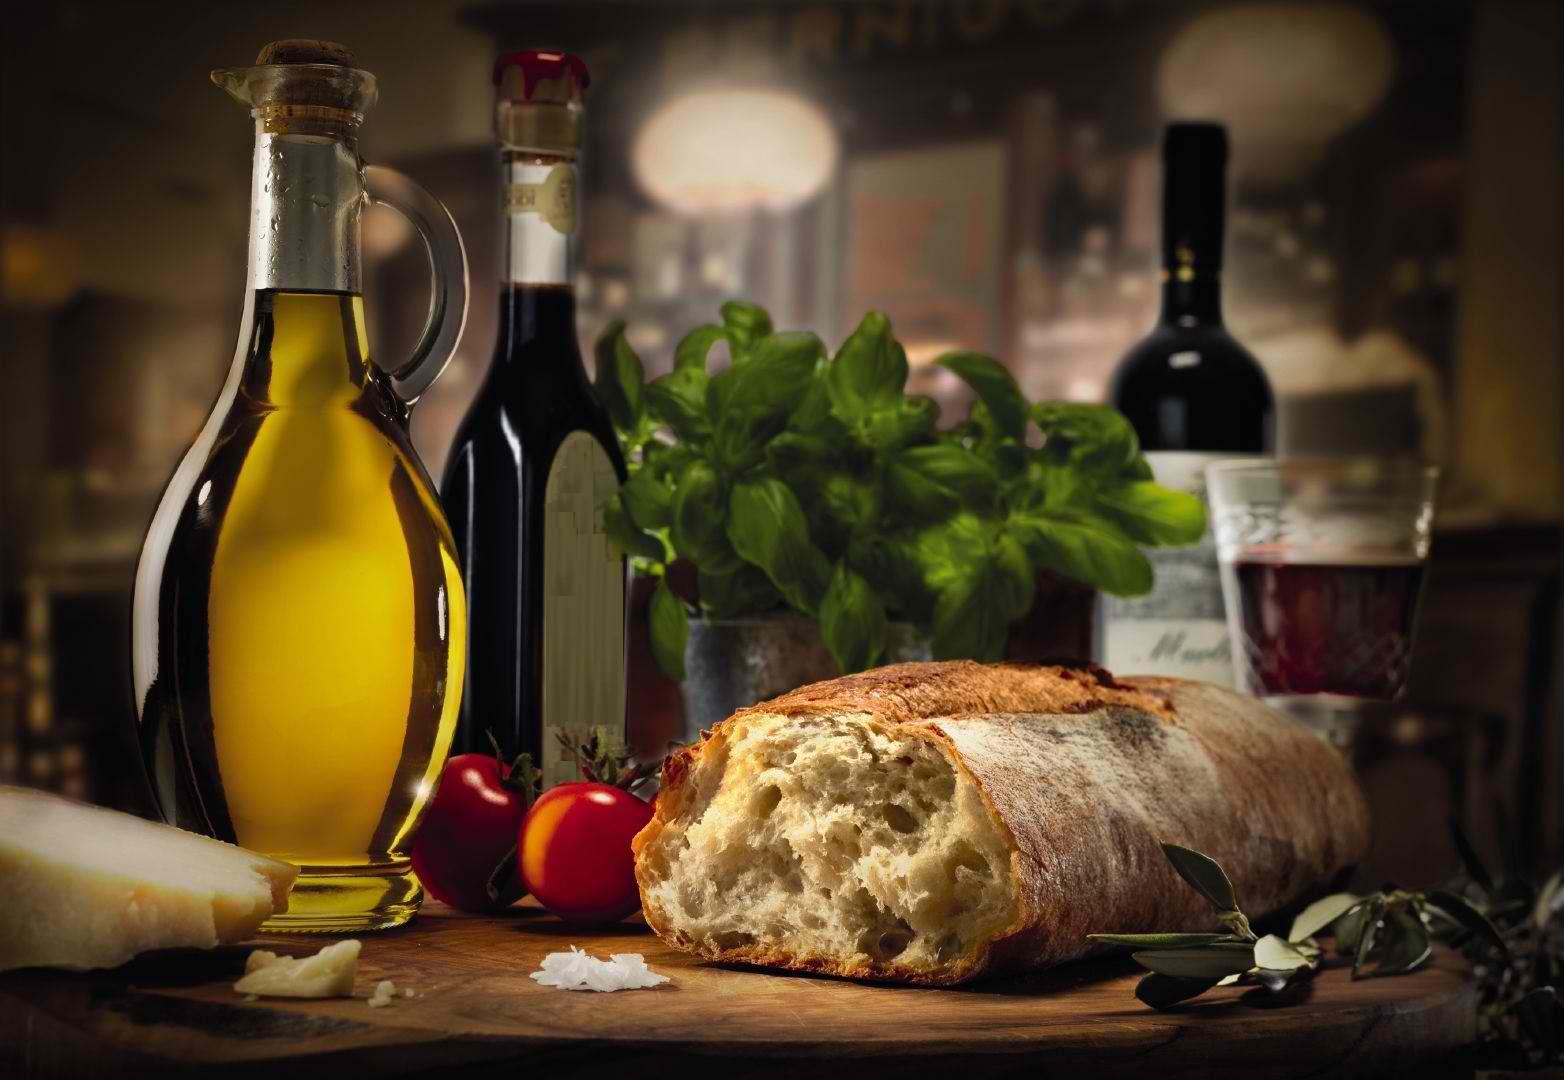 oil, wine, basic necessities